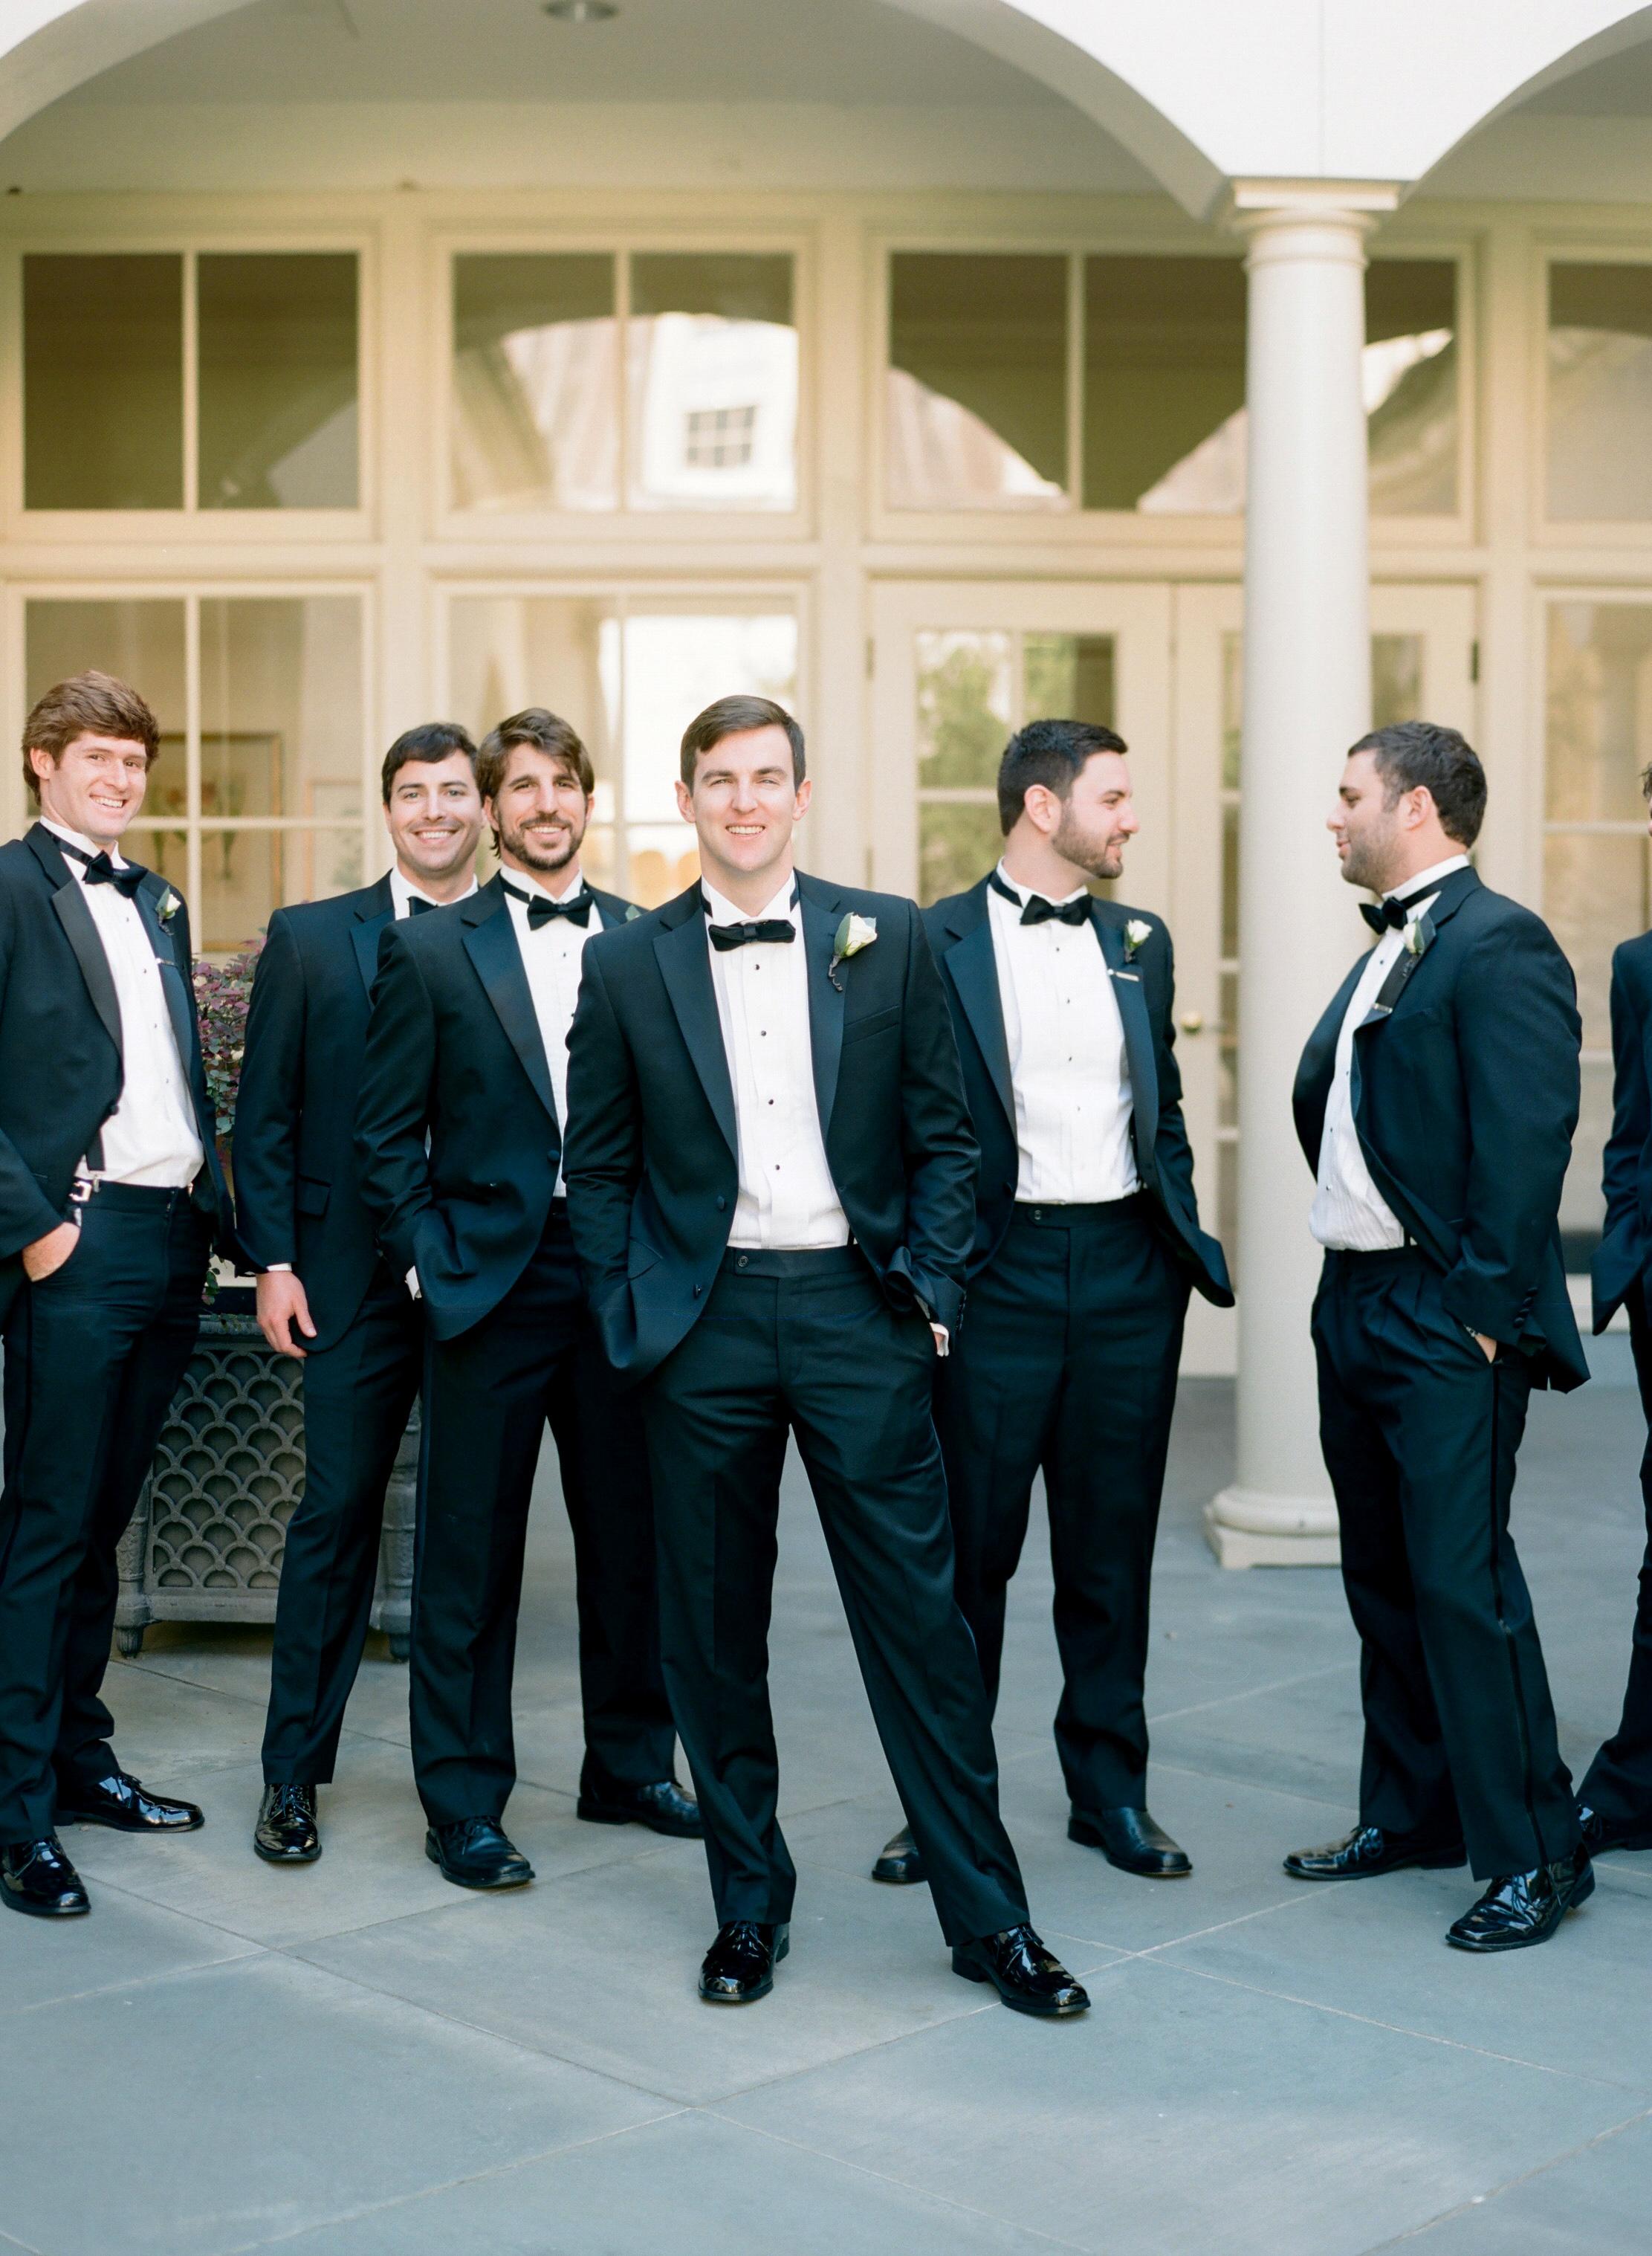 St.-Philip-Presbyterian-Church-Houston-Wedding-Ceremony-The-Junior-League-Of-Houston-Reception-Dana-Fernandez-Photography-Fine-Art-Film-11.jpg